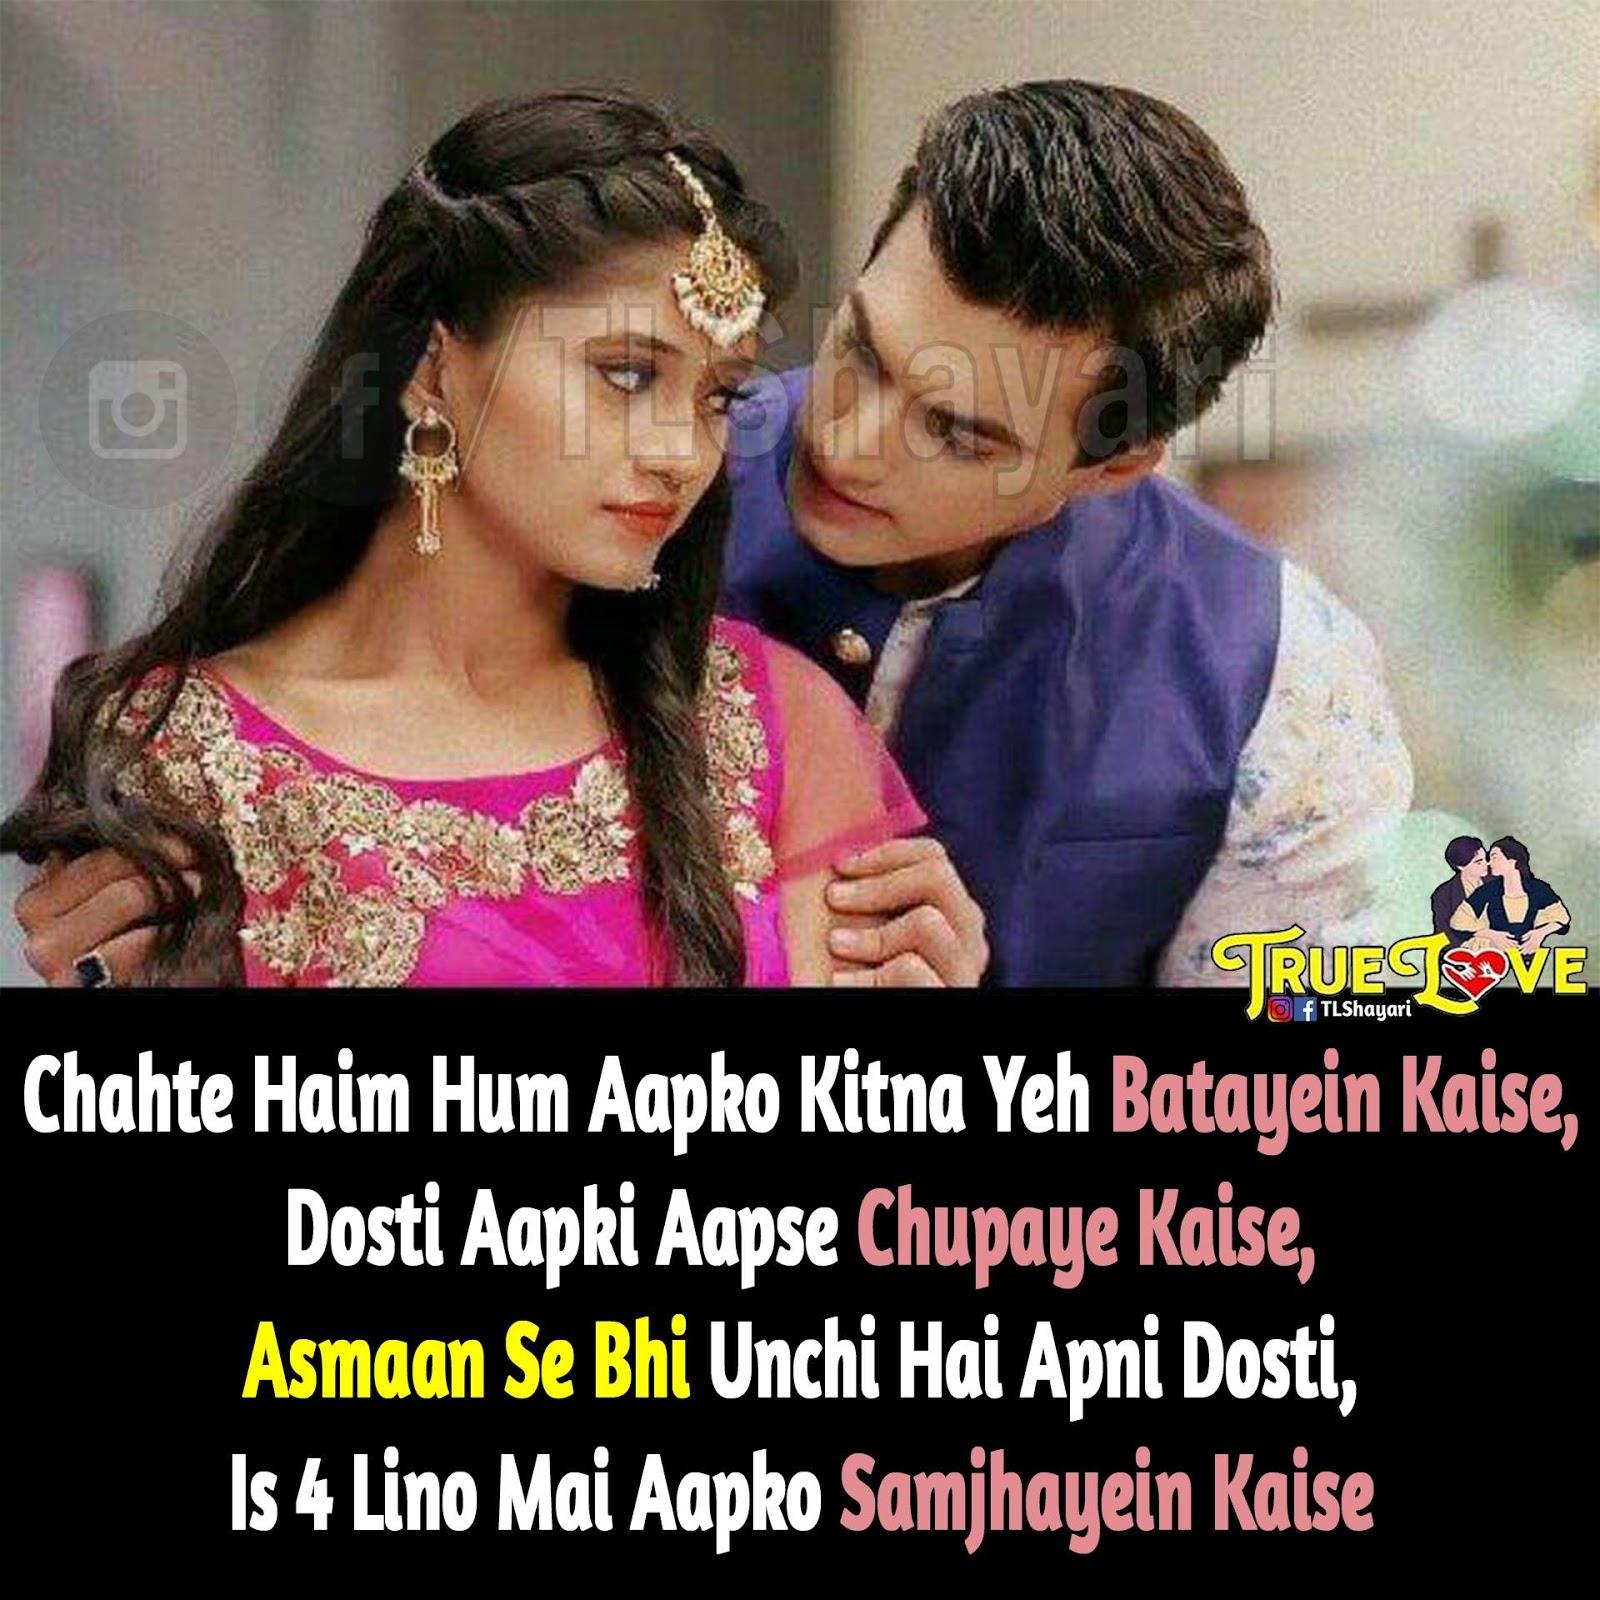 Romantic Shayari : Chahte Hain Hum Aapko Kitna Yeh